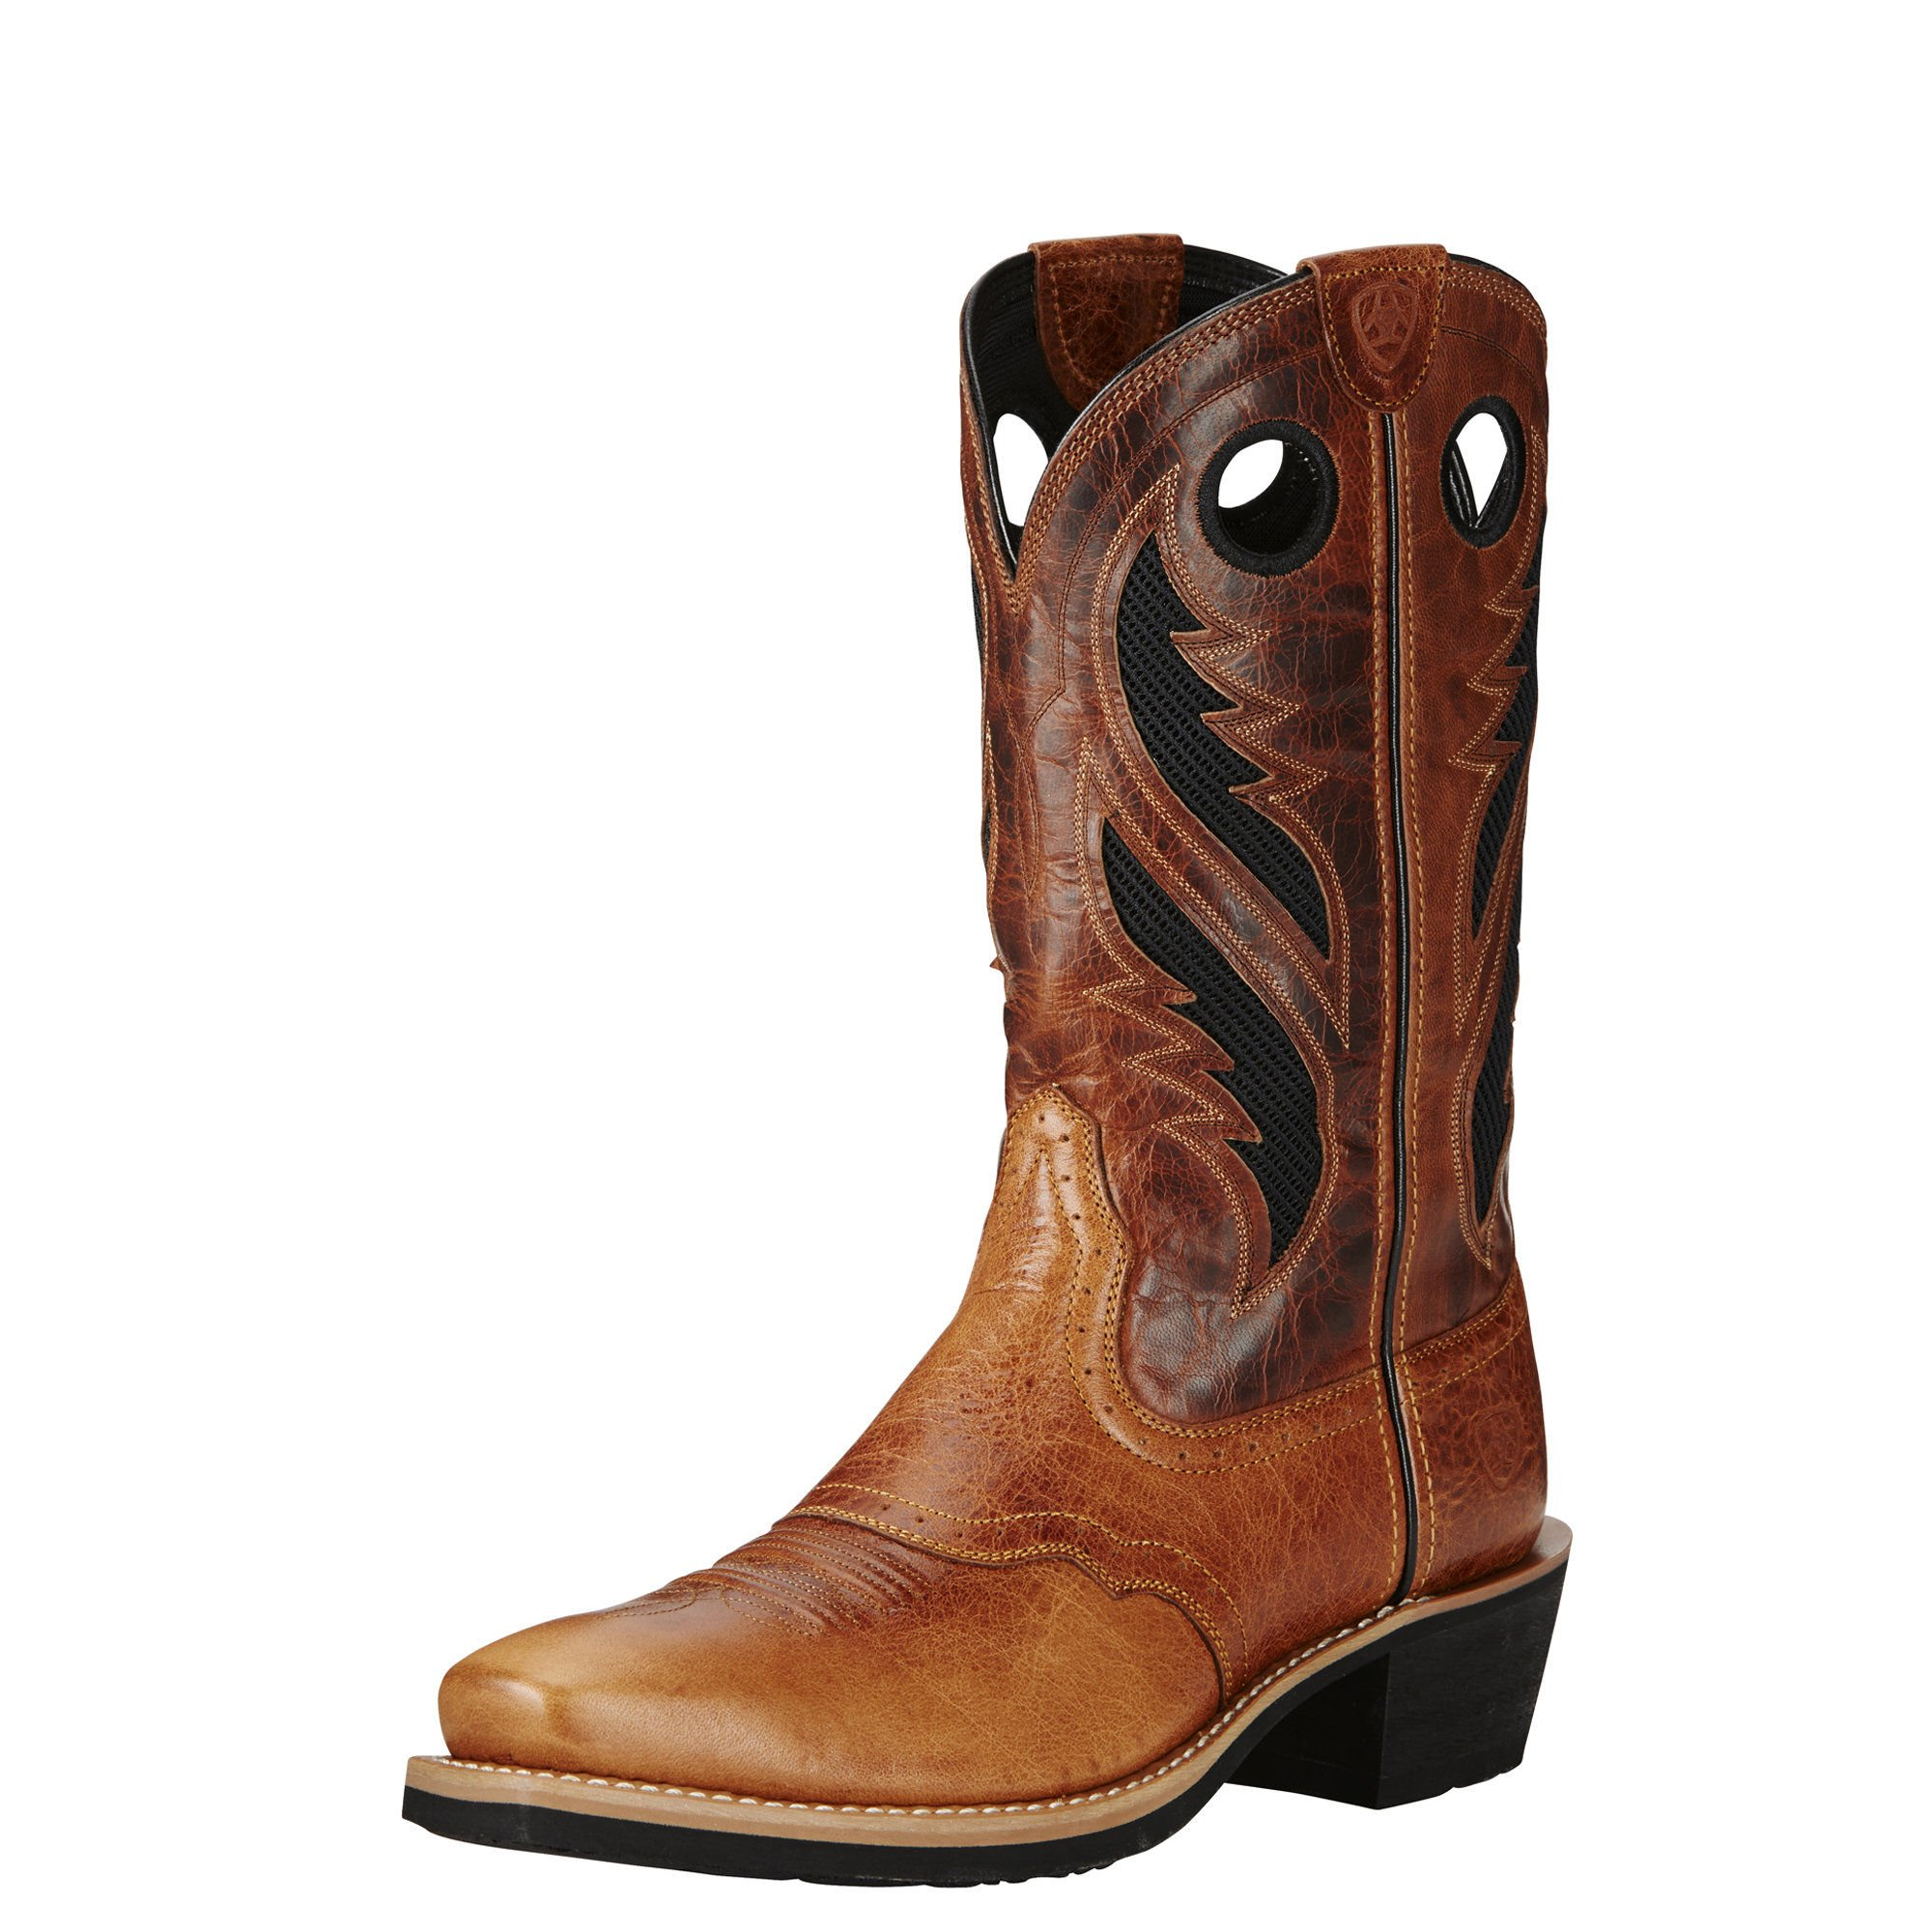 Ariat Men's Heritage Roughstock Venttek Western Cowboy Boot, Gingersnap, 9.5 2E US